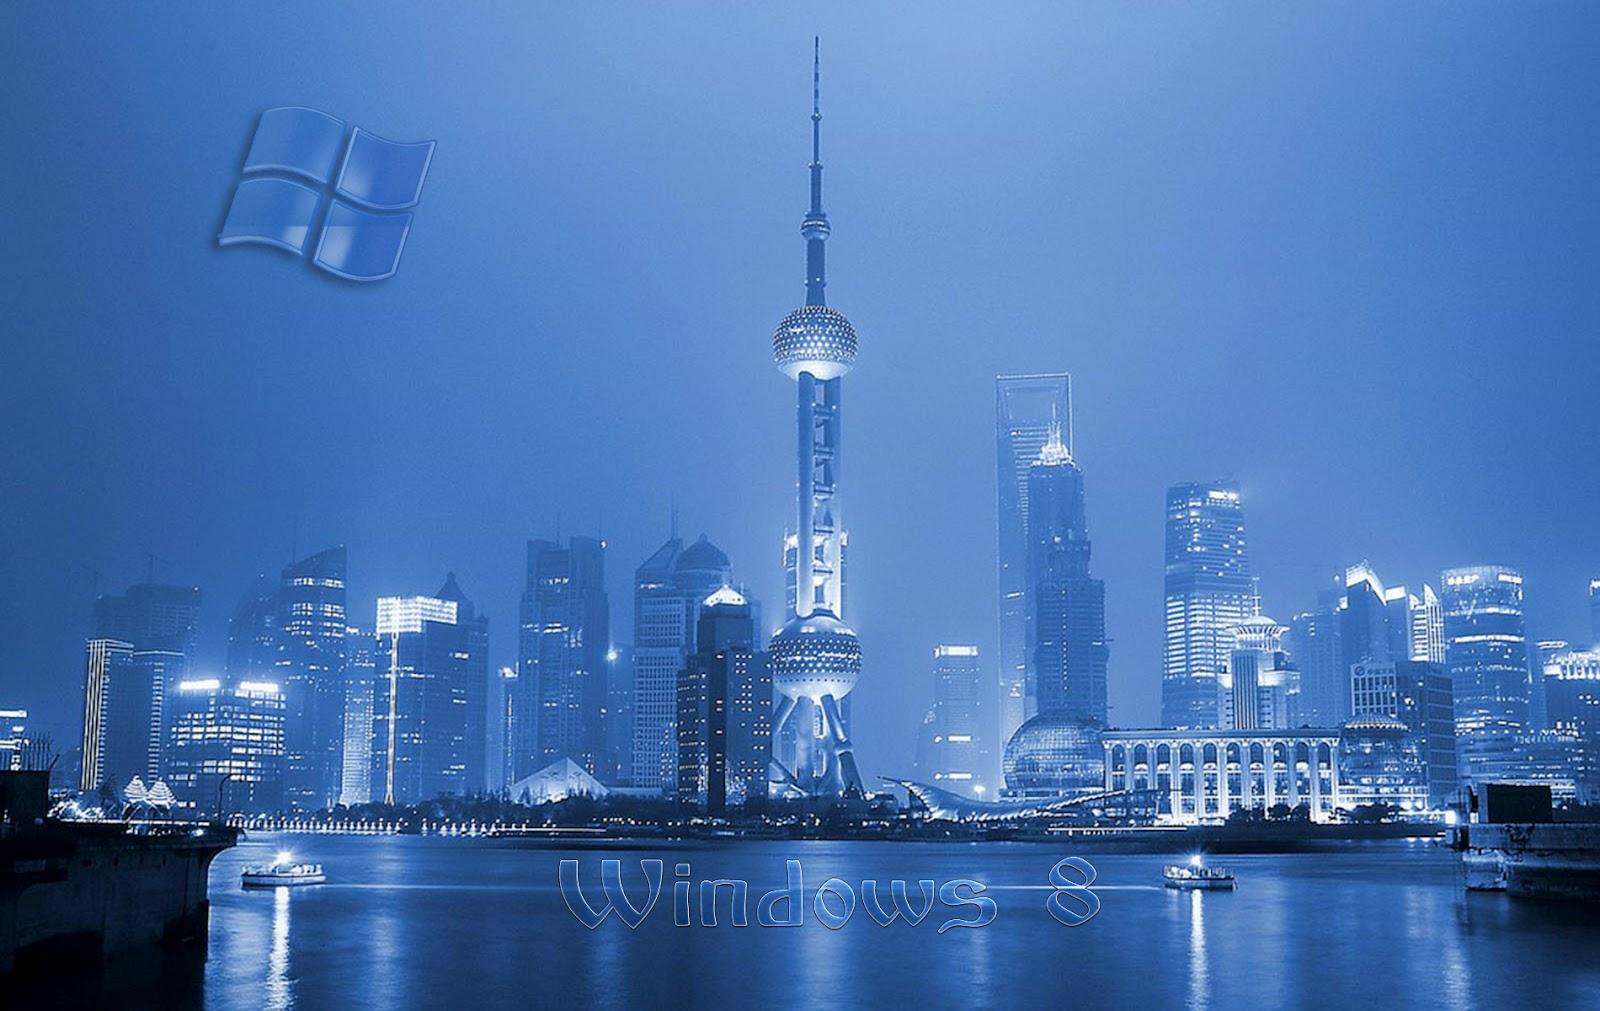 ... Wallpapers, Videos: Windows 8 Hd 1080 Wallpaper, Blue Hd Wallpaper